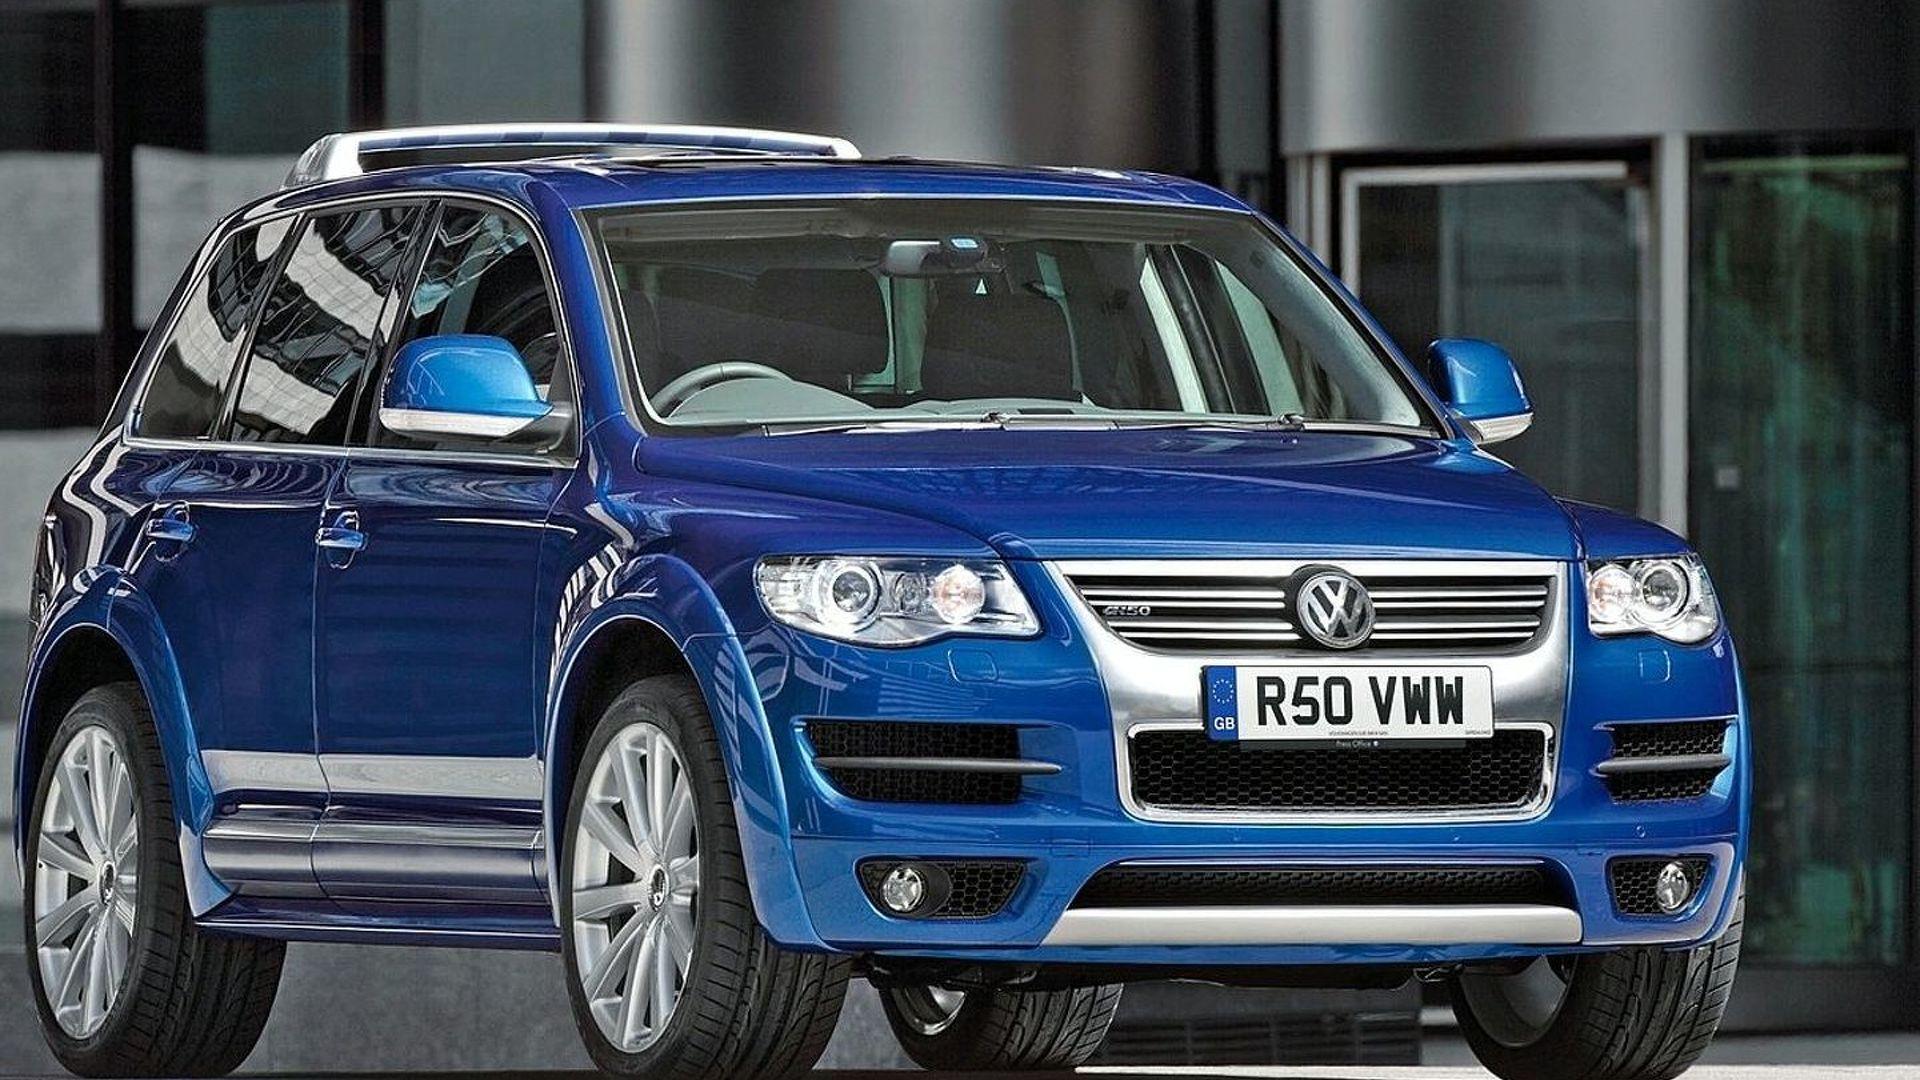 Volkswagen Touareg For Sale >> Volkswagen Touareg R50 Goes On Sale